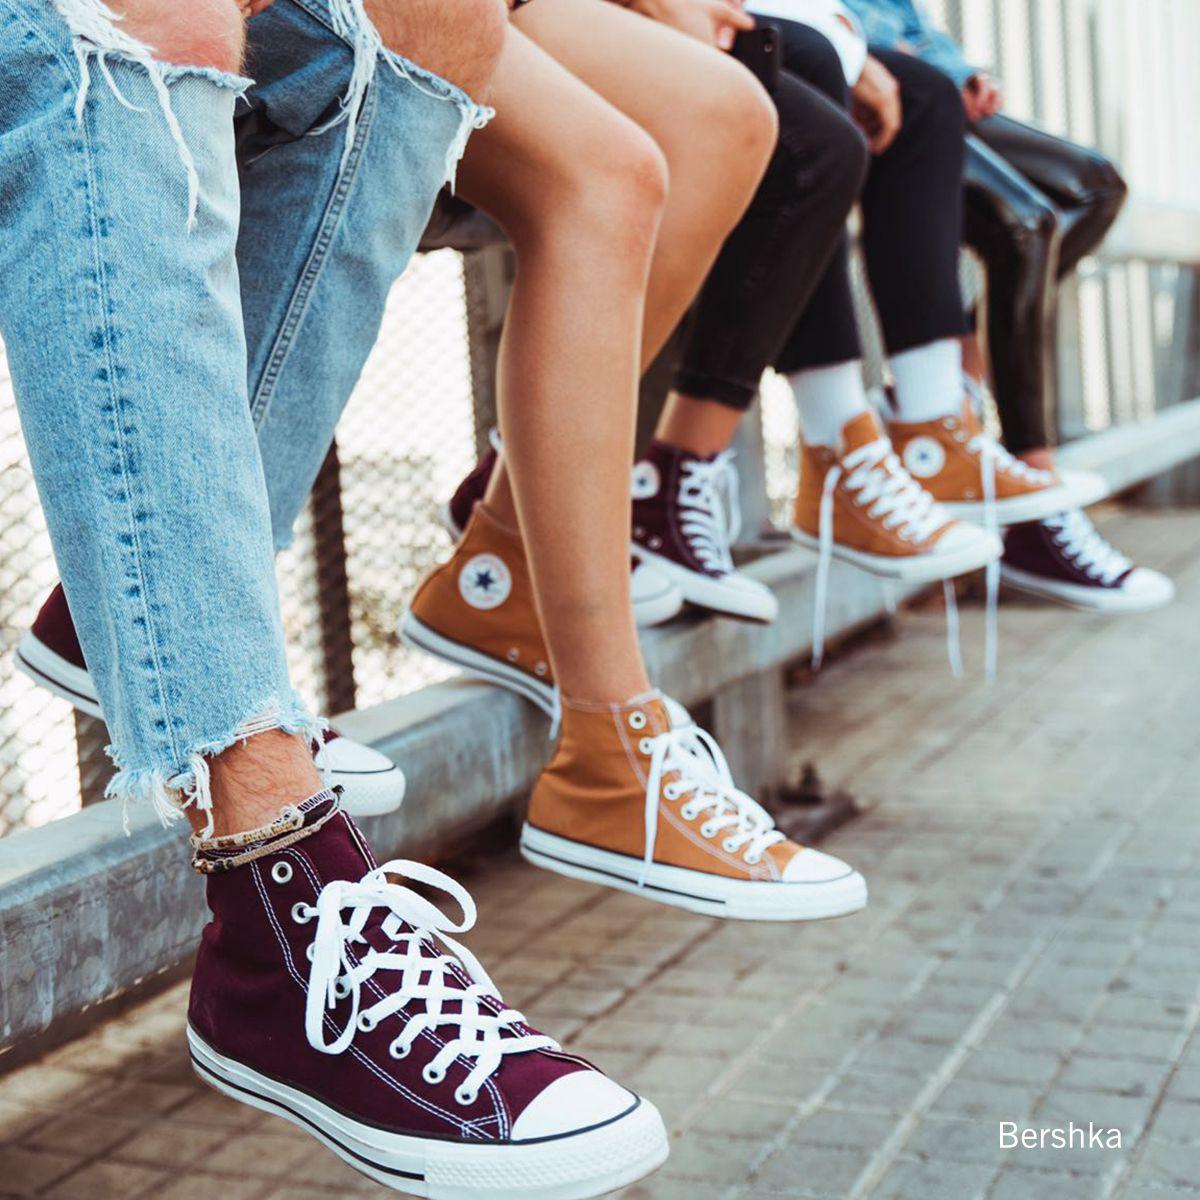 b917d4926f CONVERSE ALL STAR high top canvas sneakers. #Converse #Bershka #mustard  #burgundy